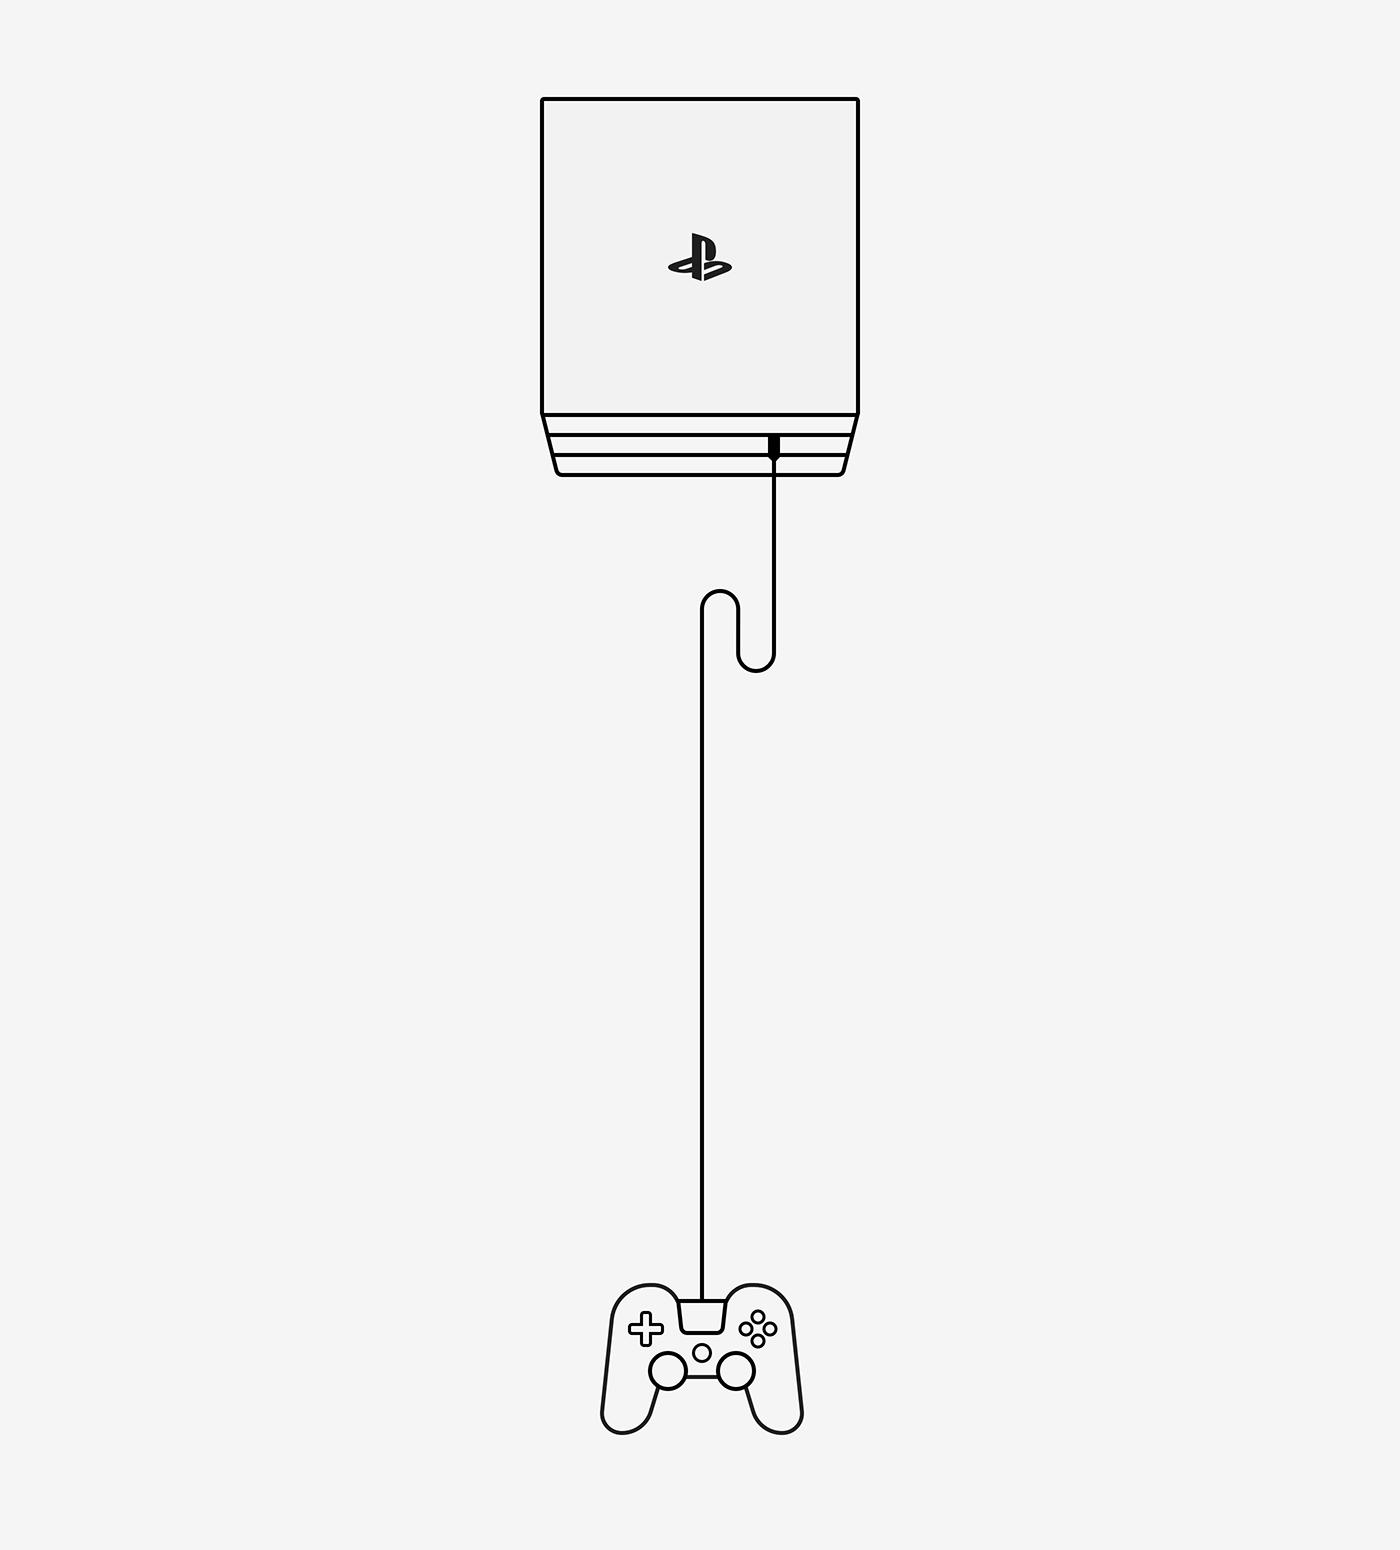 Playstation极简风格APP概念皇冠新2网